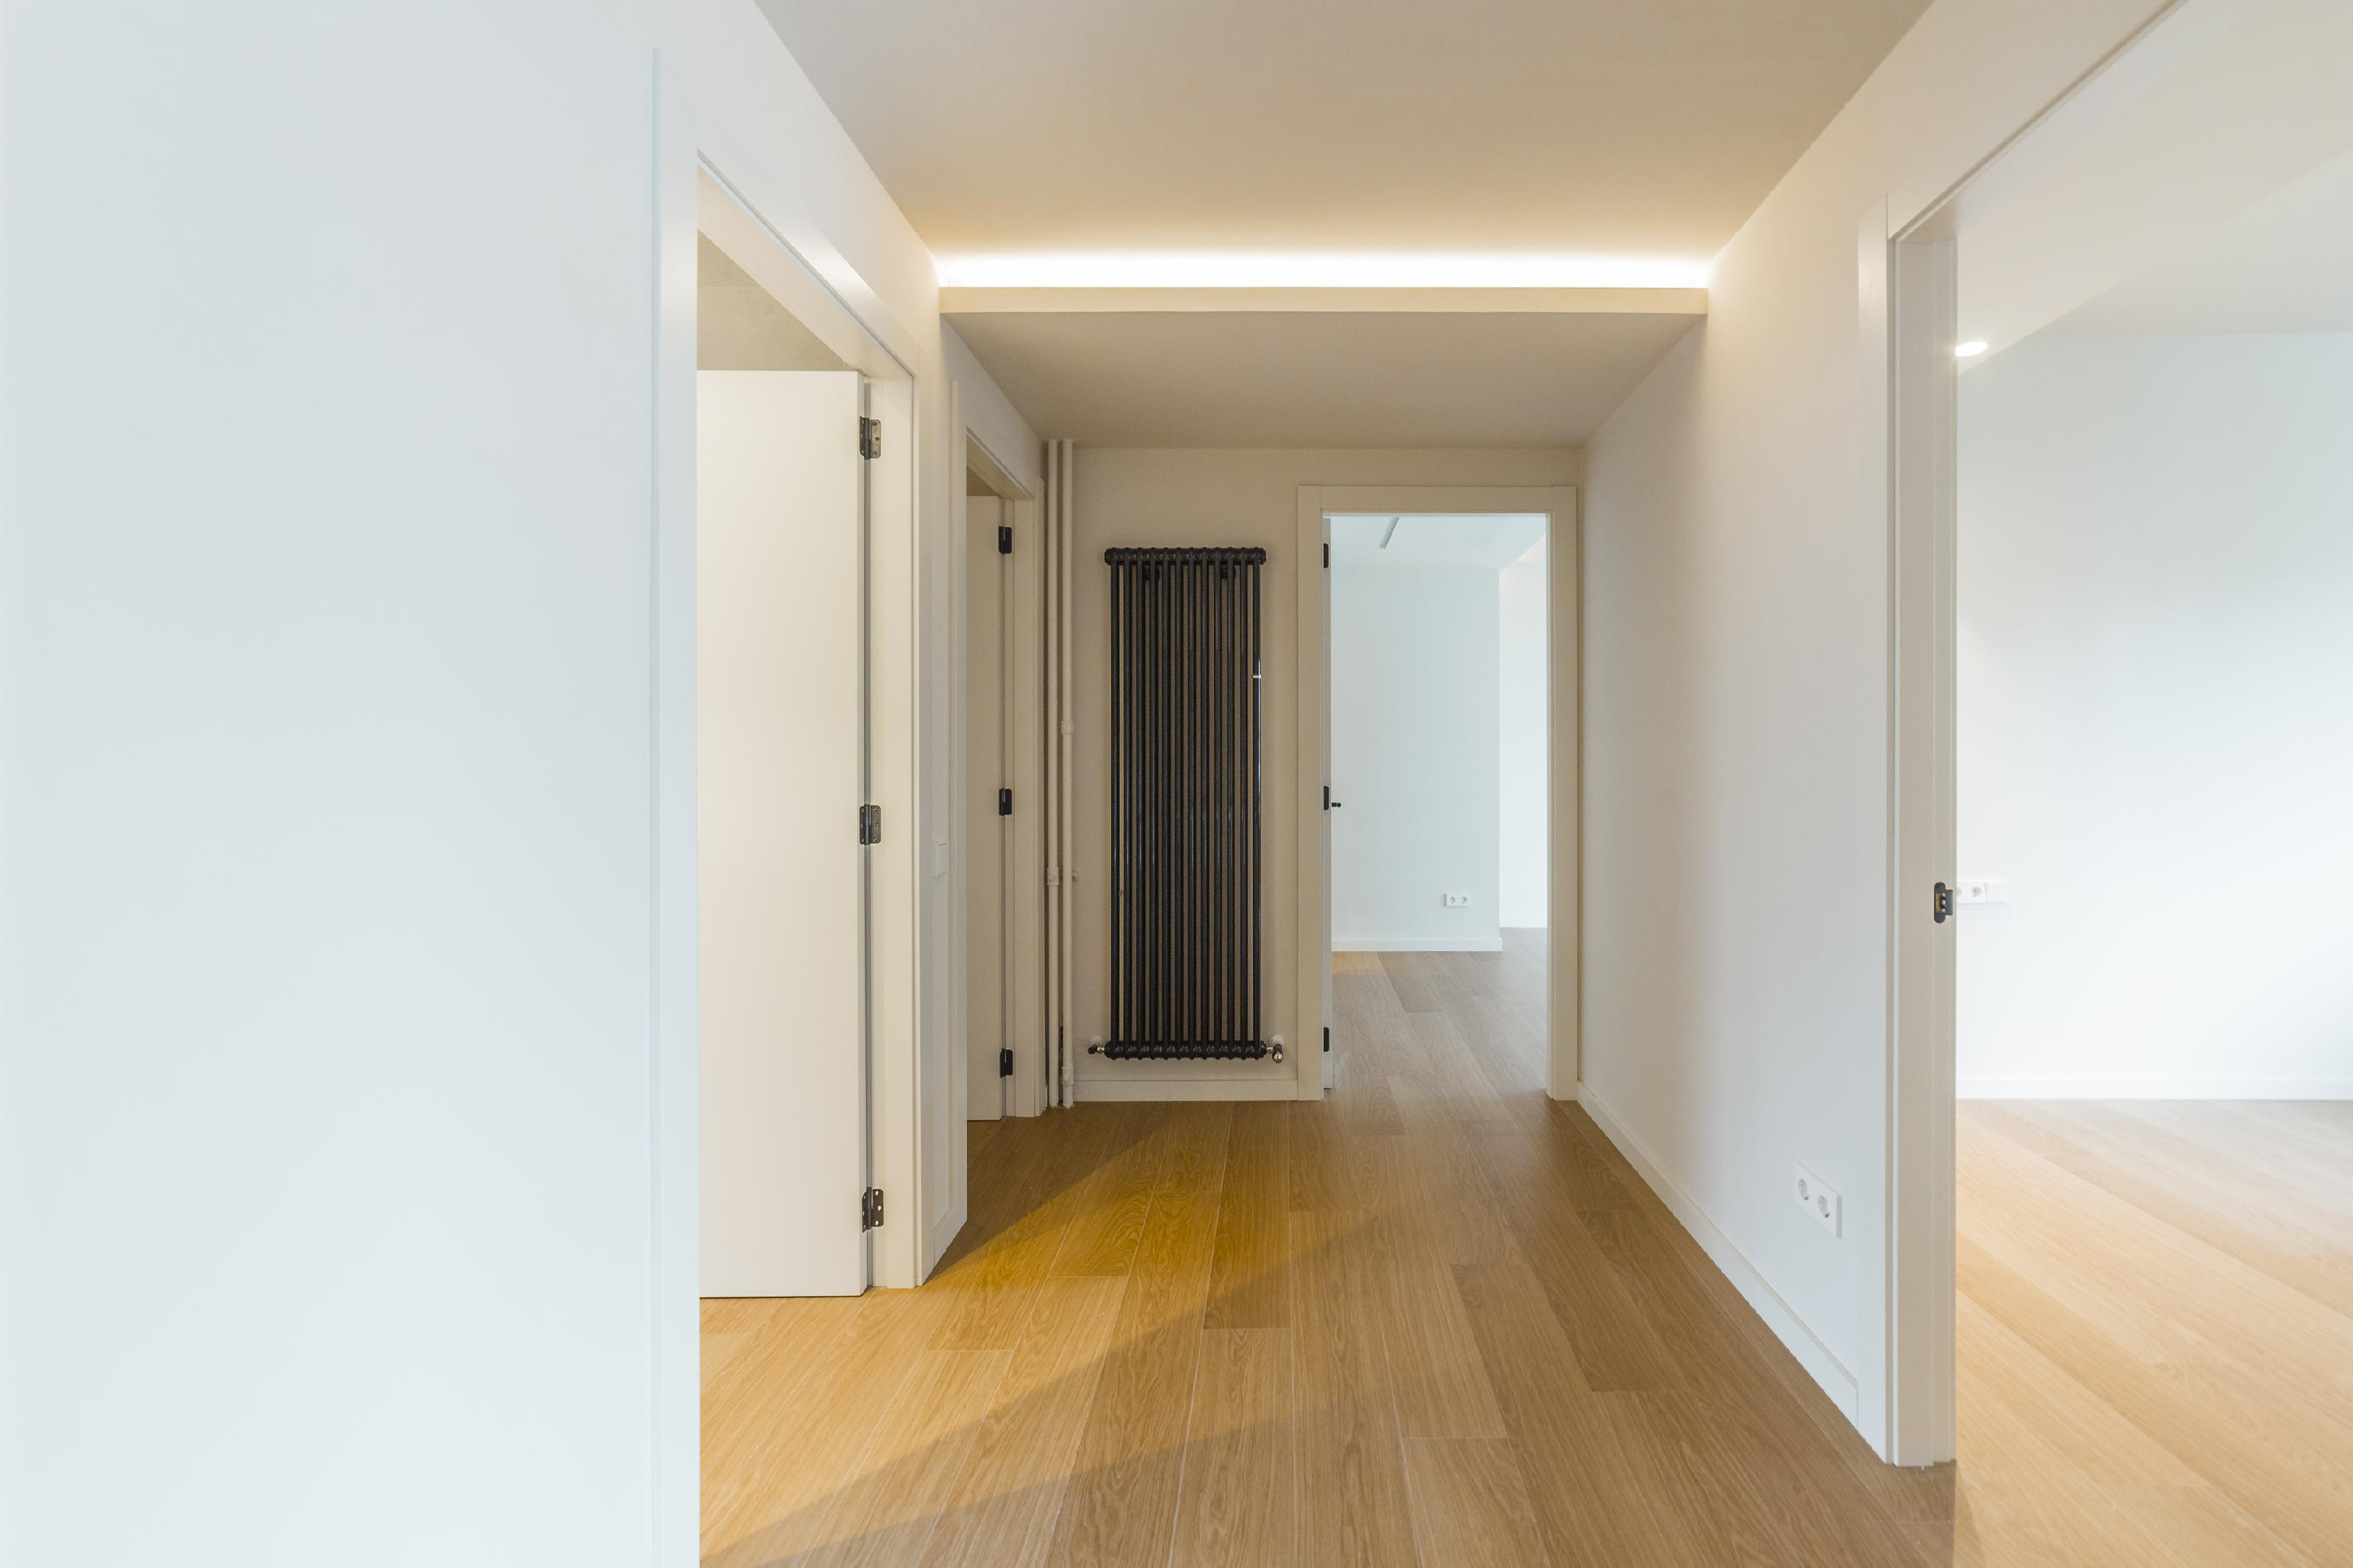 253492 Flat for sale in Sarrià-Sant Gervasi, Sant Gervasi-Galvany 42